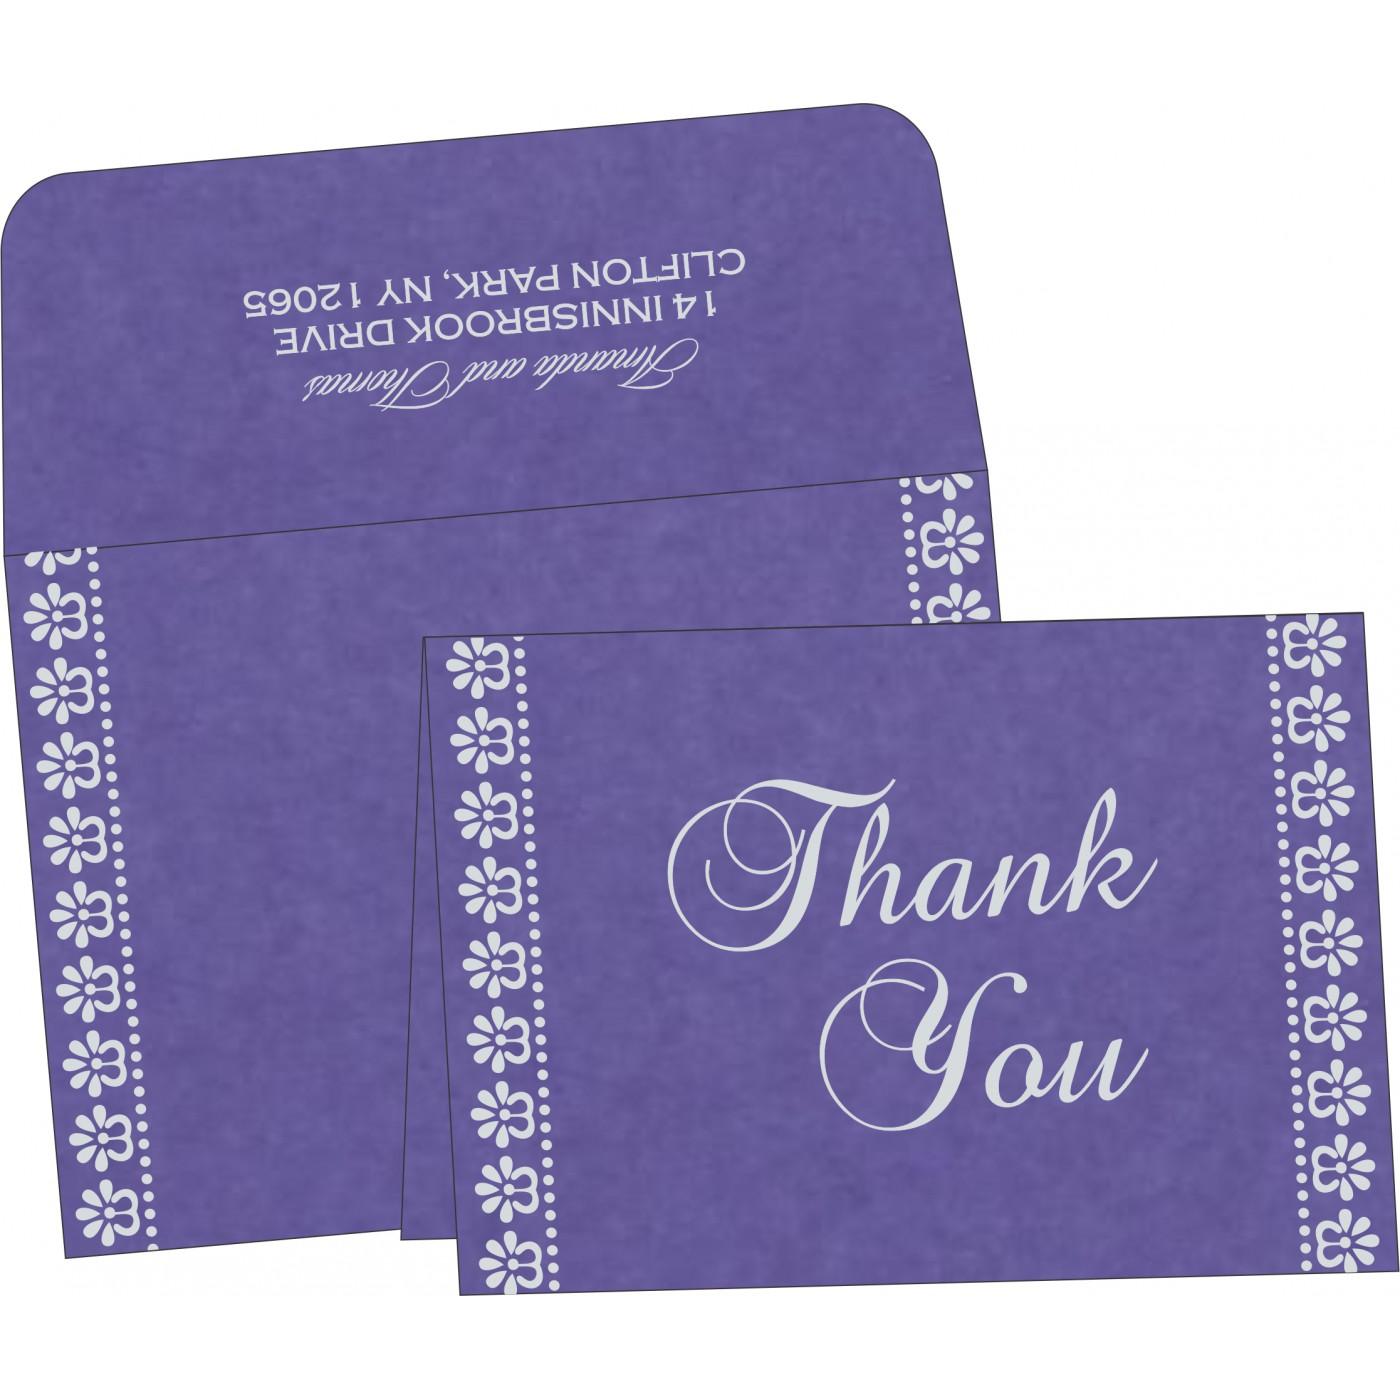 Thank You Cards : TYC-8231K - 123WeddingCards